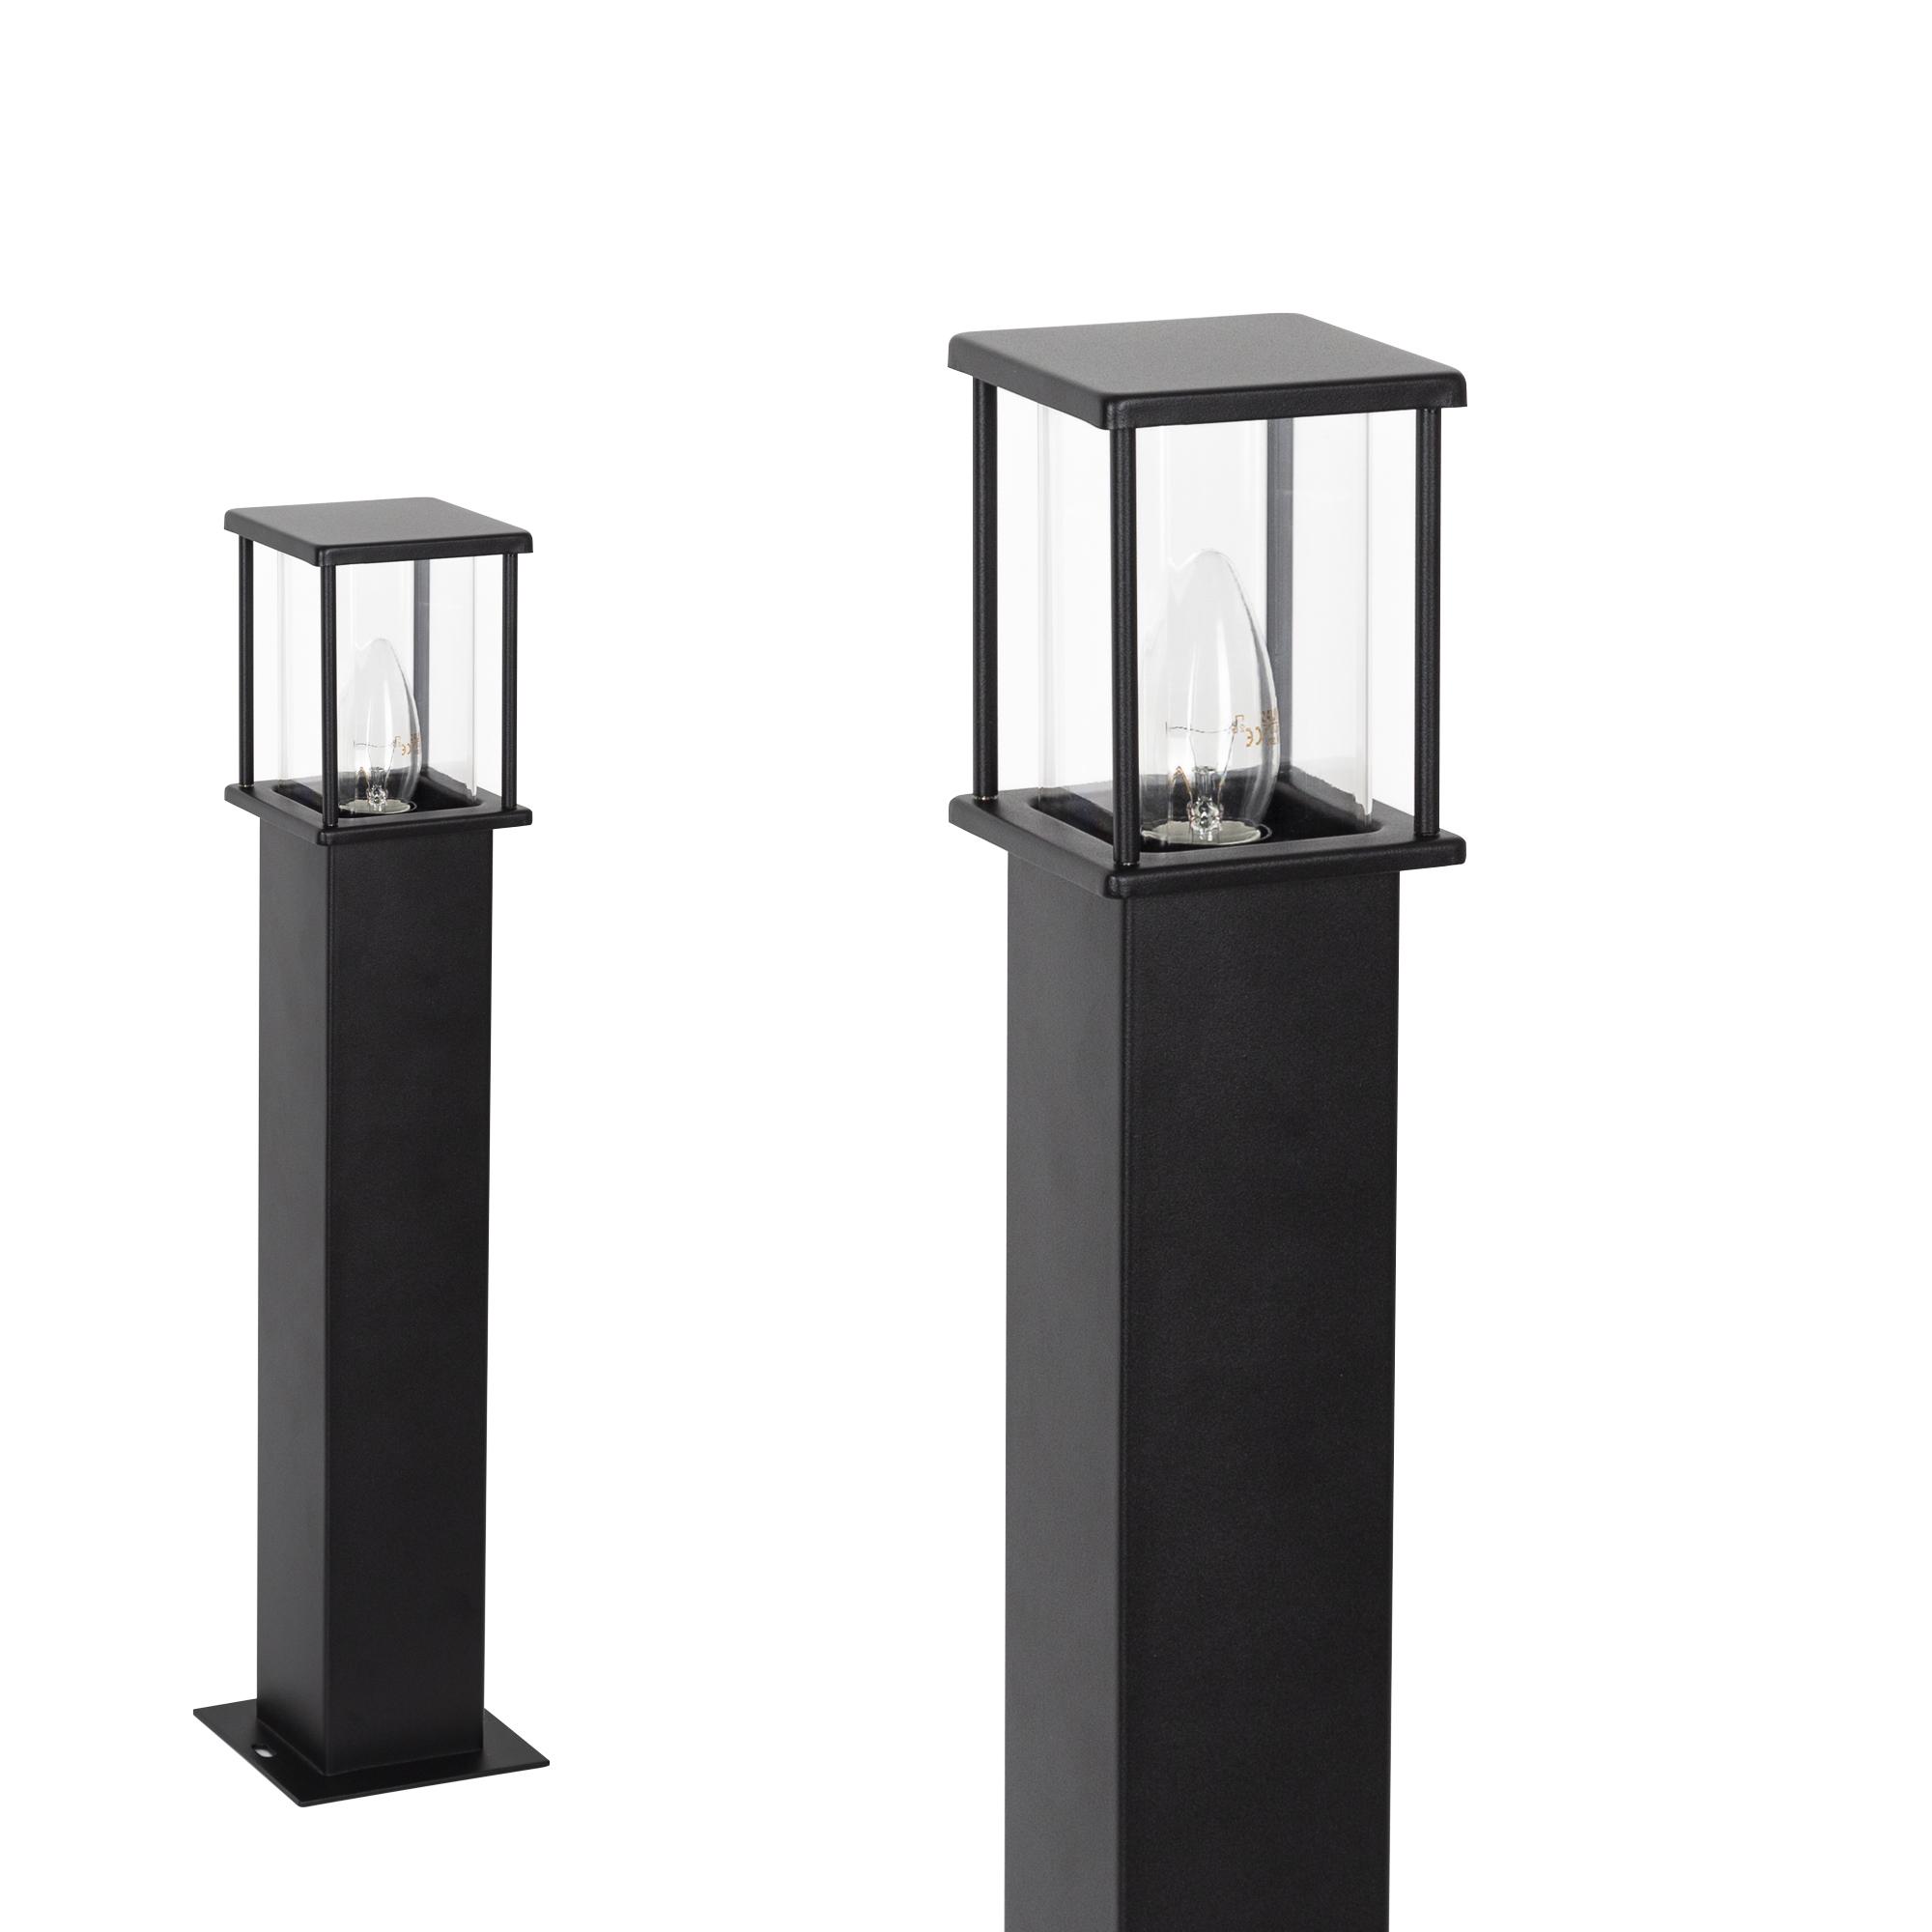 Tuinlamp Astro 2 zwart